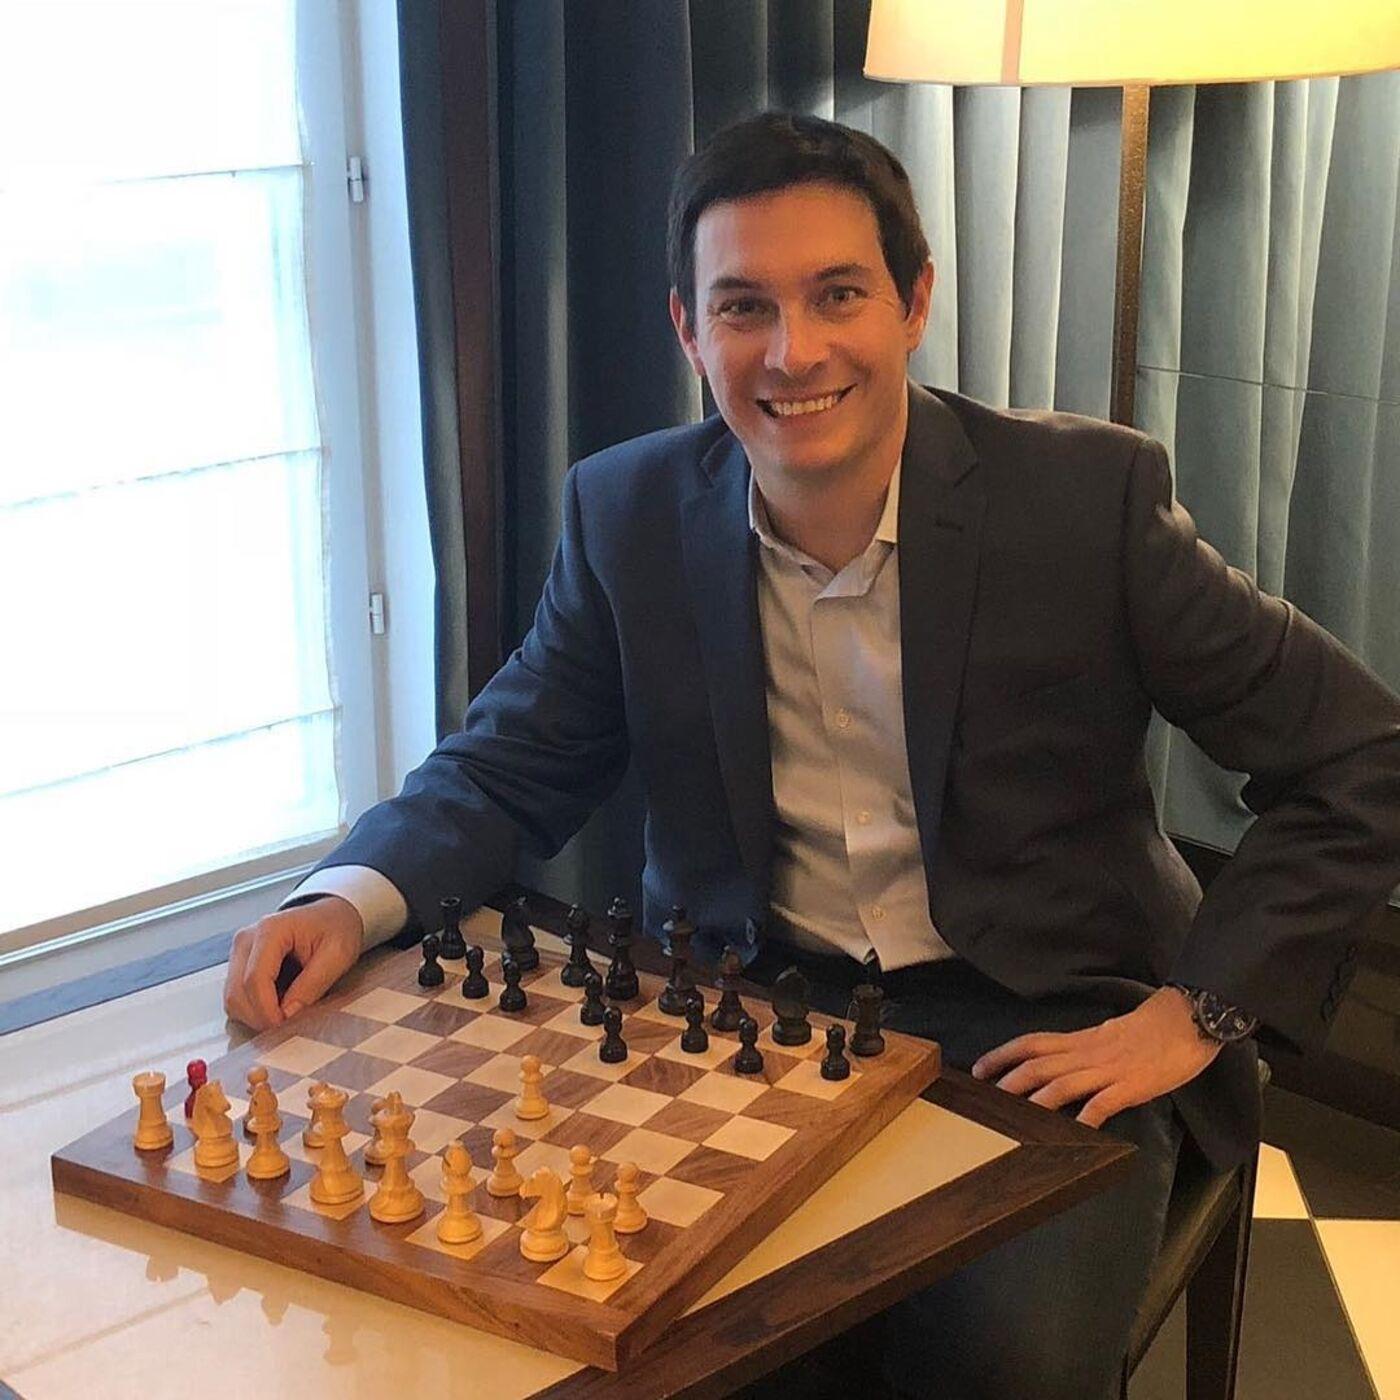 153rd Episode with International Master Carlos Perdomo, Founder of Chess Atlanta